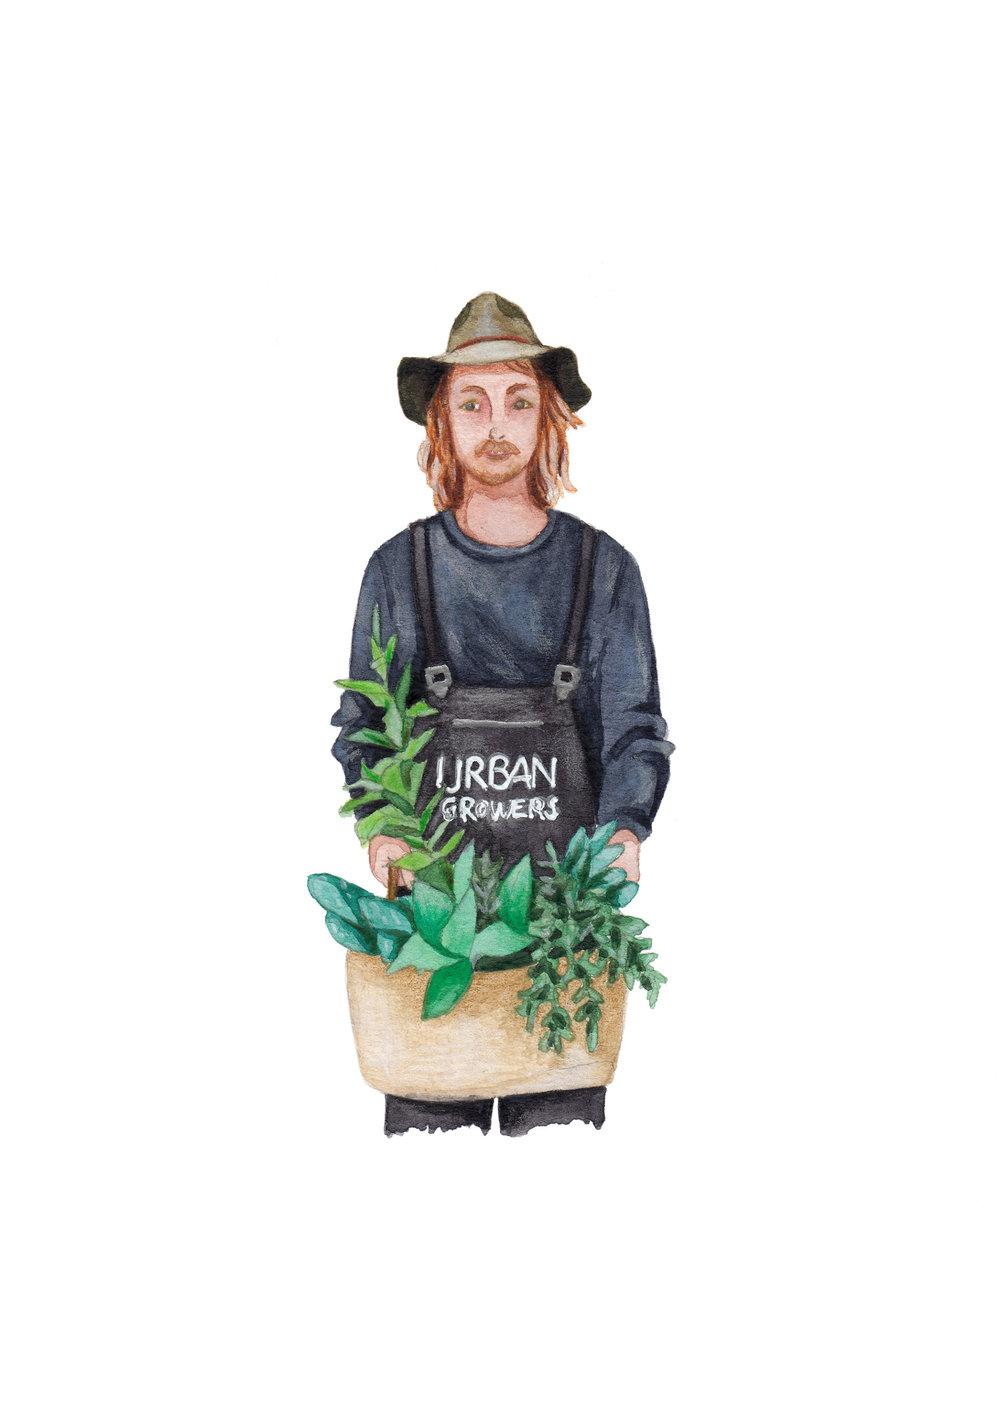 urbangrowers.jpg